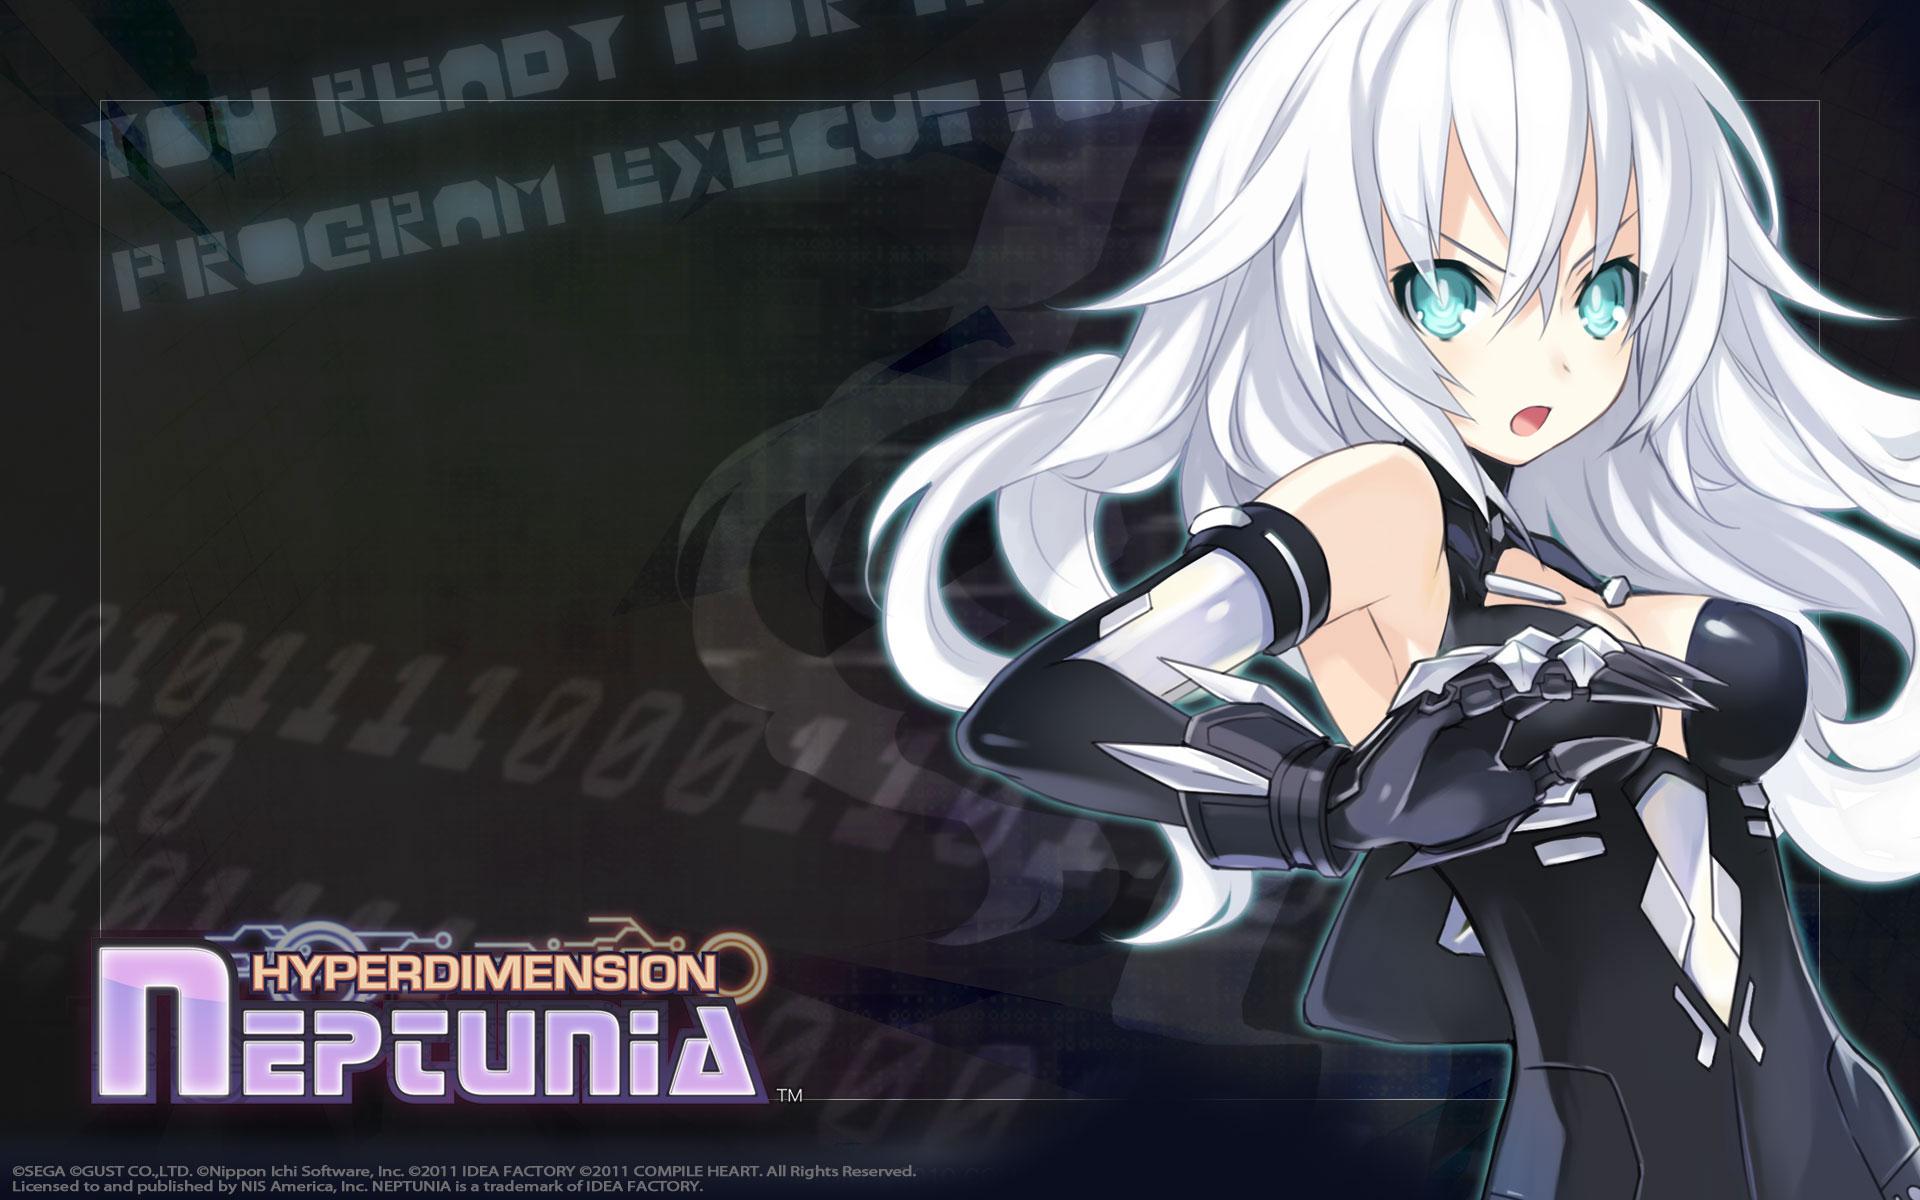 Hyperdimension Neptunia Wallpaper 005 – Black Heart (Noire)